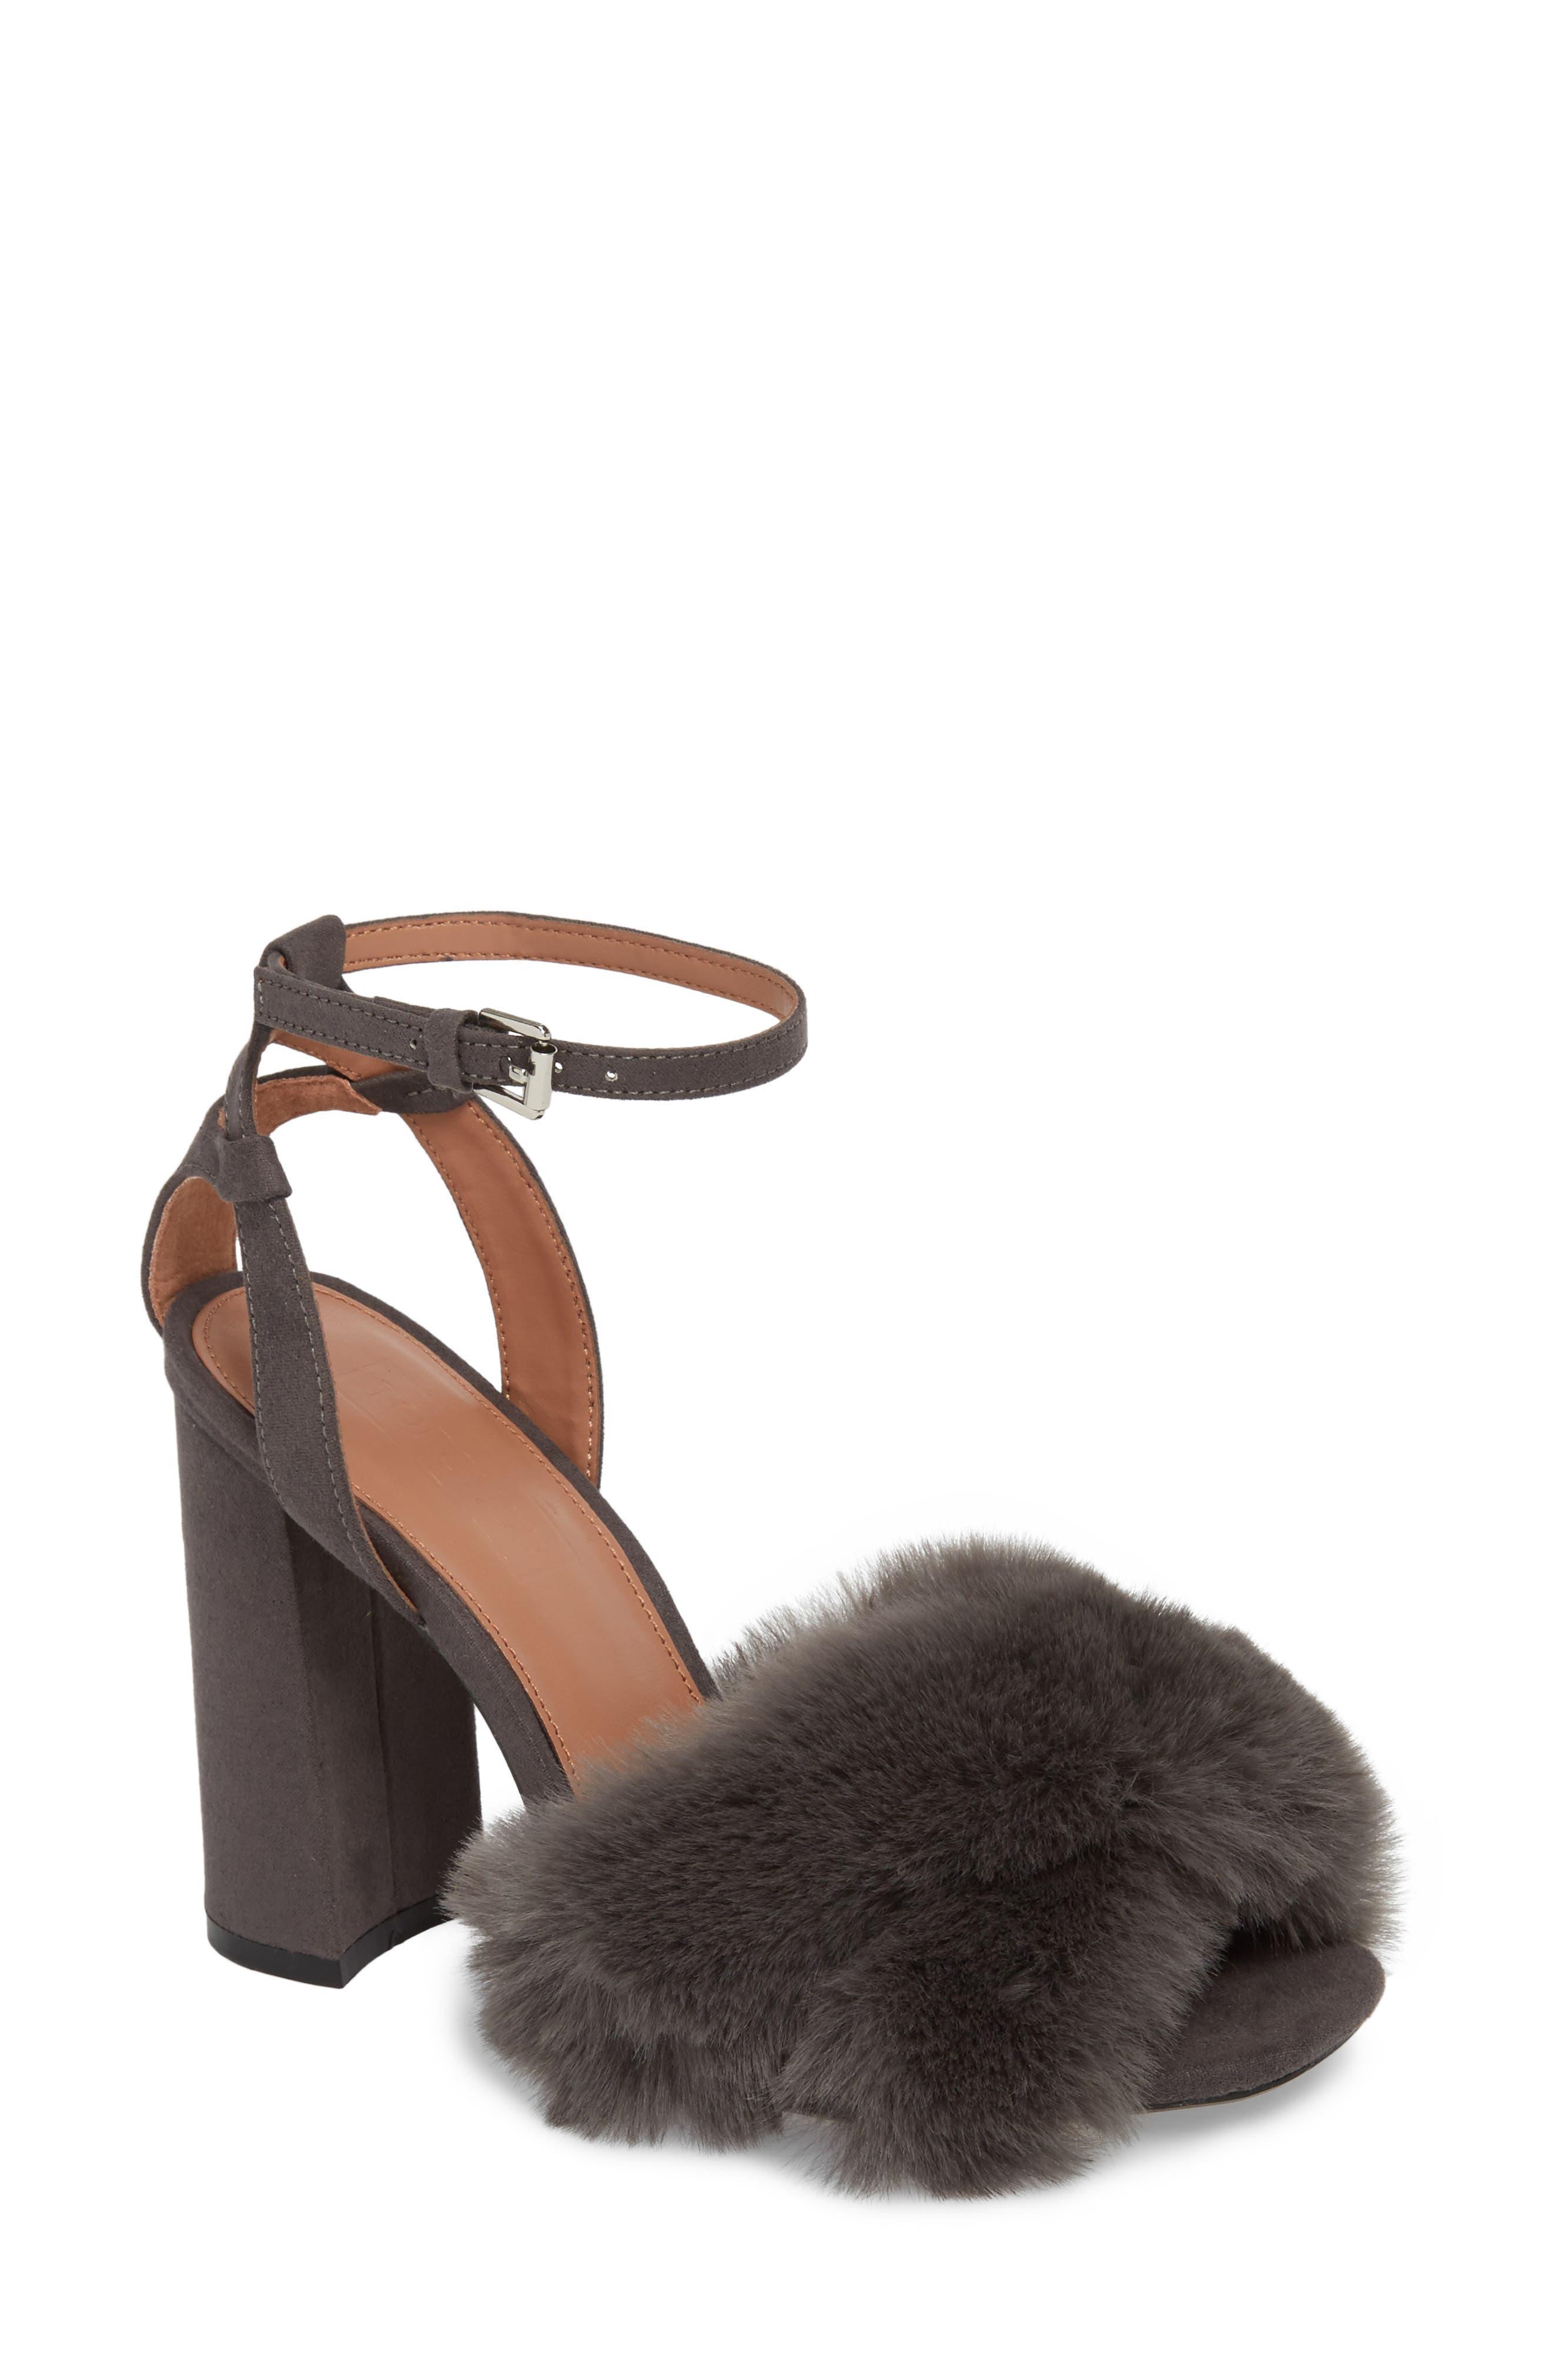 Sassy Faux Fur Sandal,                             Main thumbnail 1, color,                             020